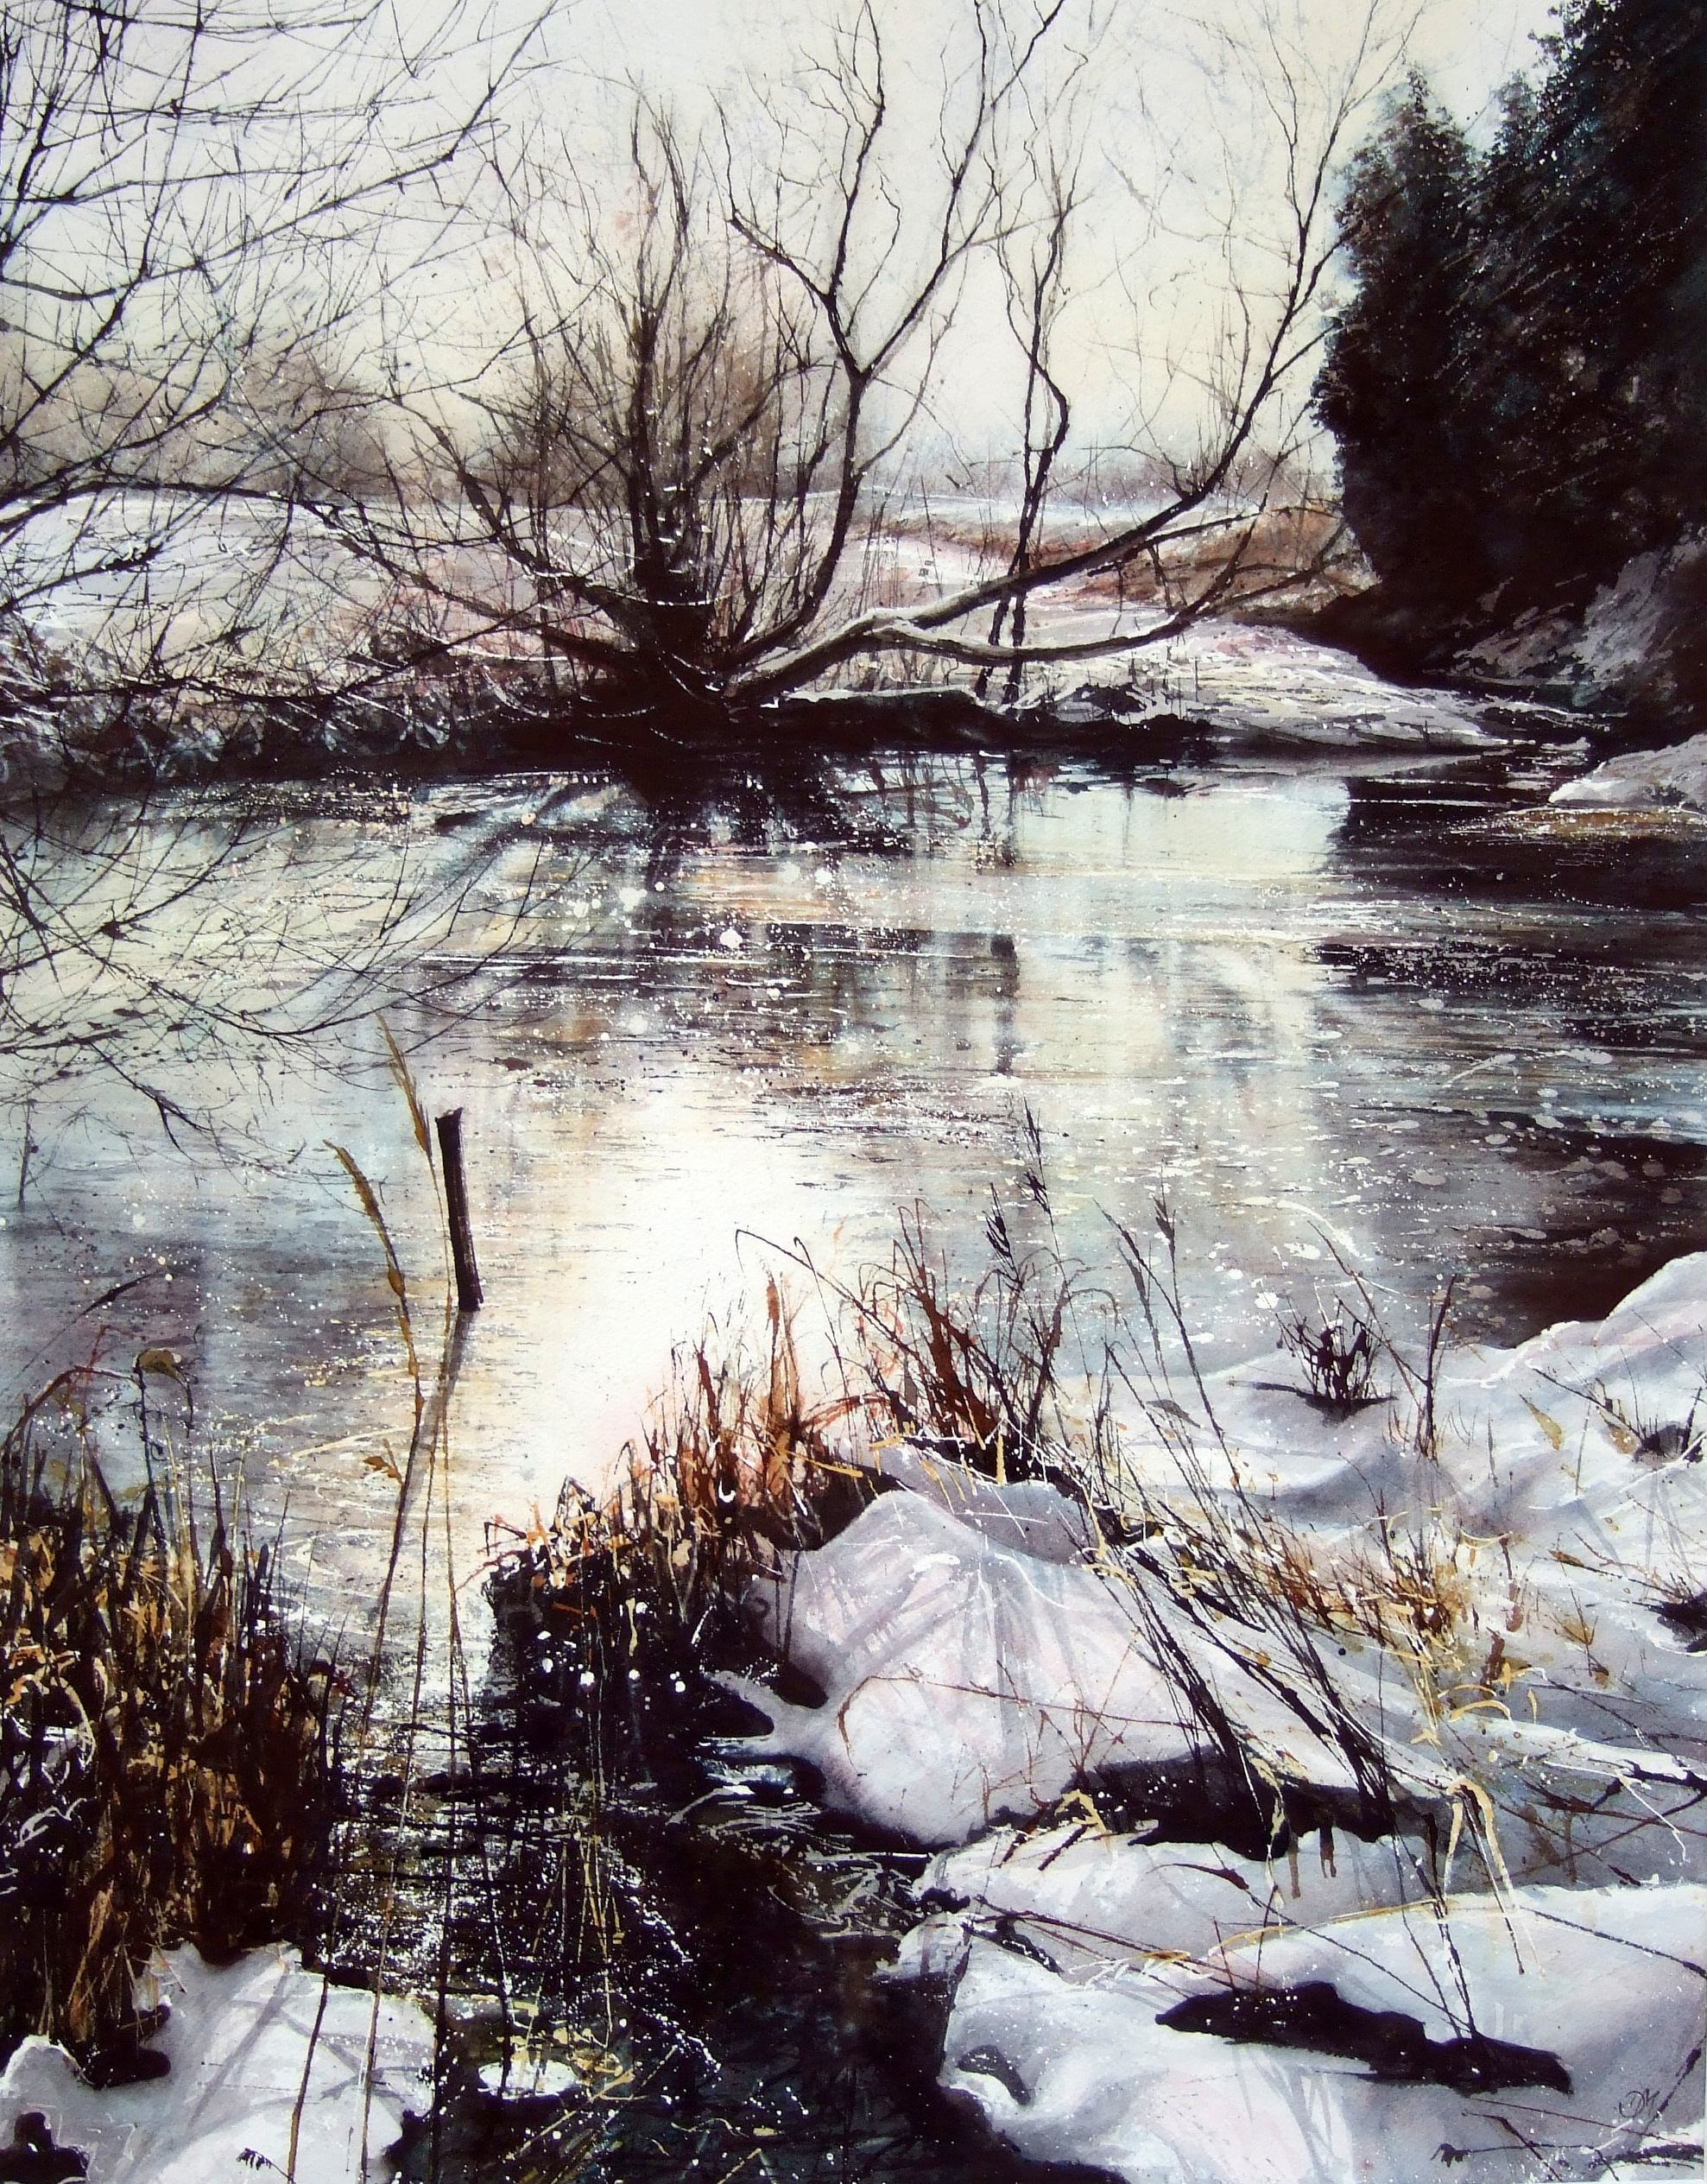 Snow Melts; Floods Rise